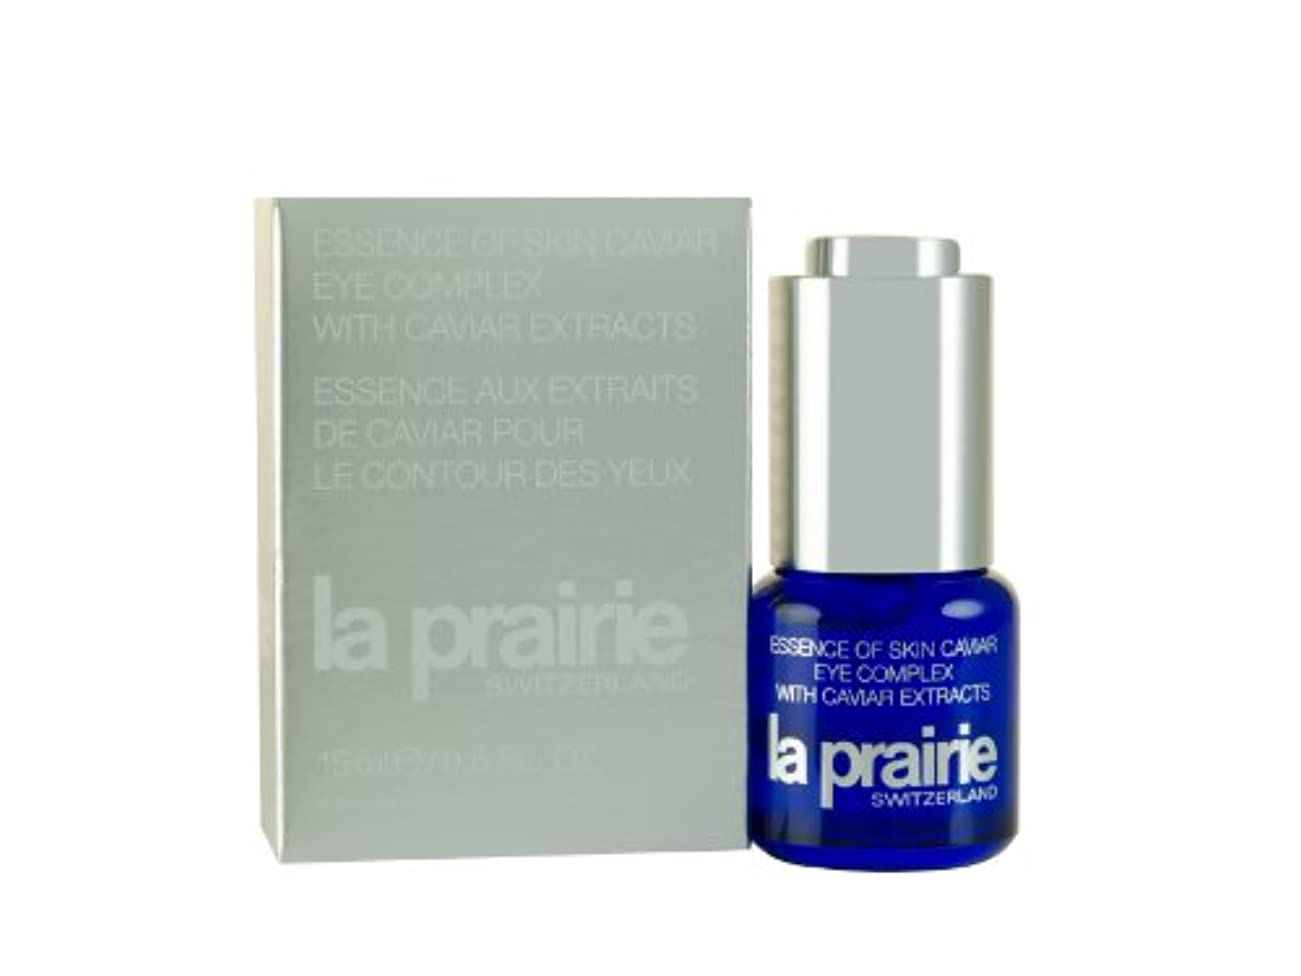 いう料理輸血La Prairie SKIN CAVIAR essence eye complex 15ml [海外直送品] [並行輸入品]